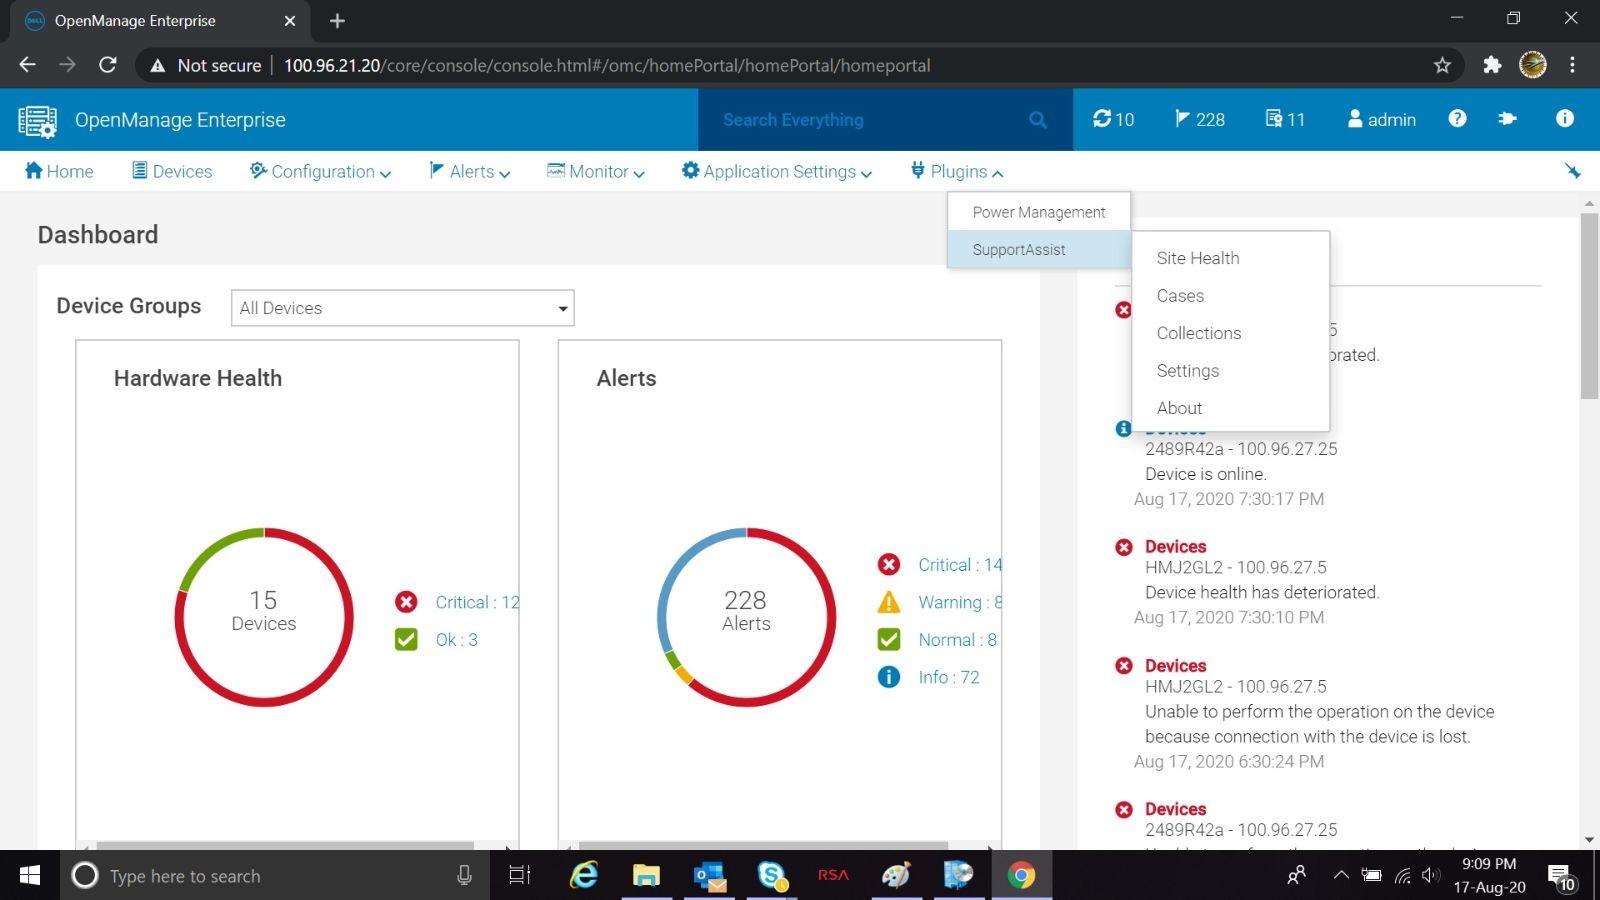 Menú de Dell EMC OpenManage Enterprise SupportAssist